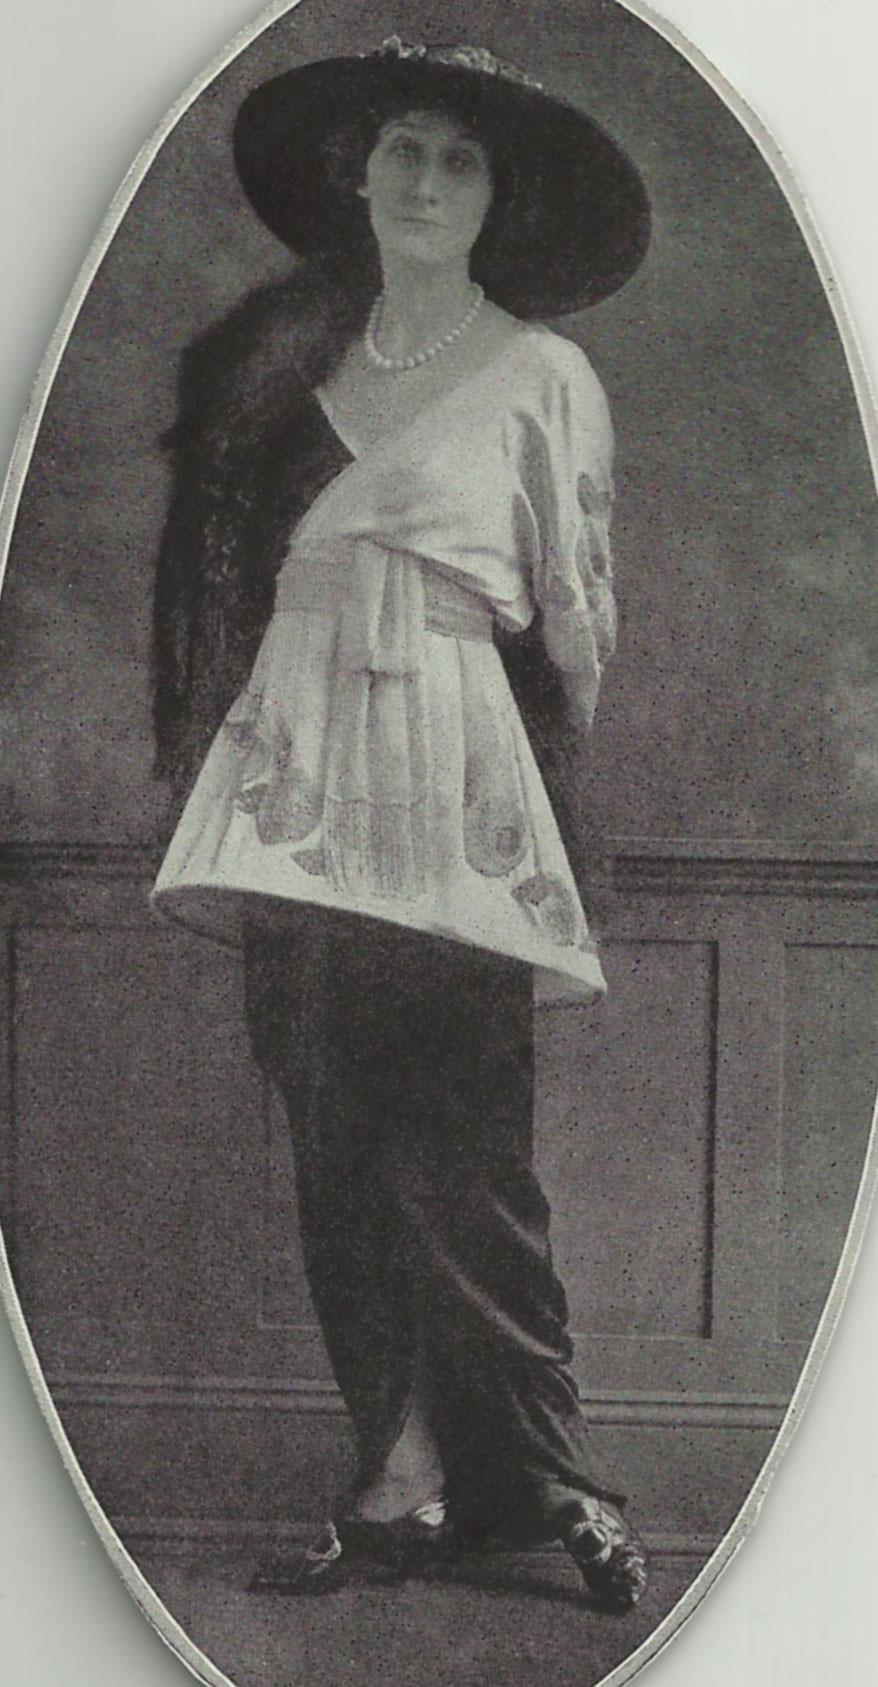 Comtesse de Sauvigny wearing Sorbet in Vogue, July 15, 1914